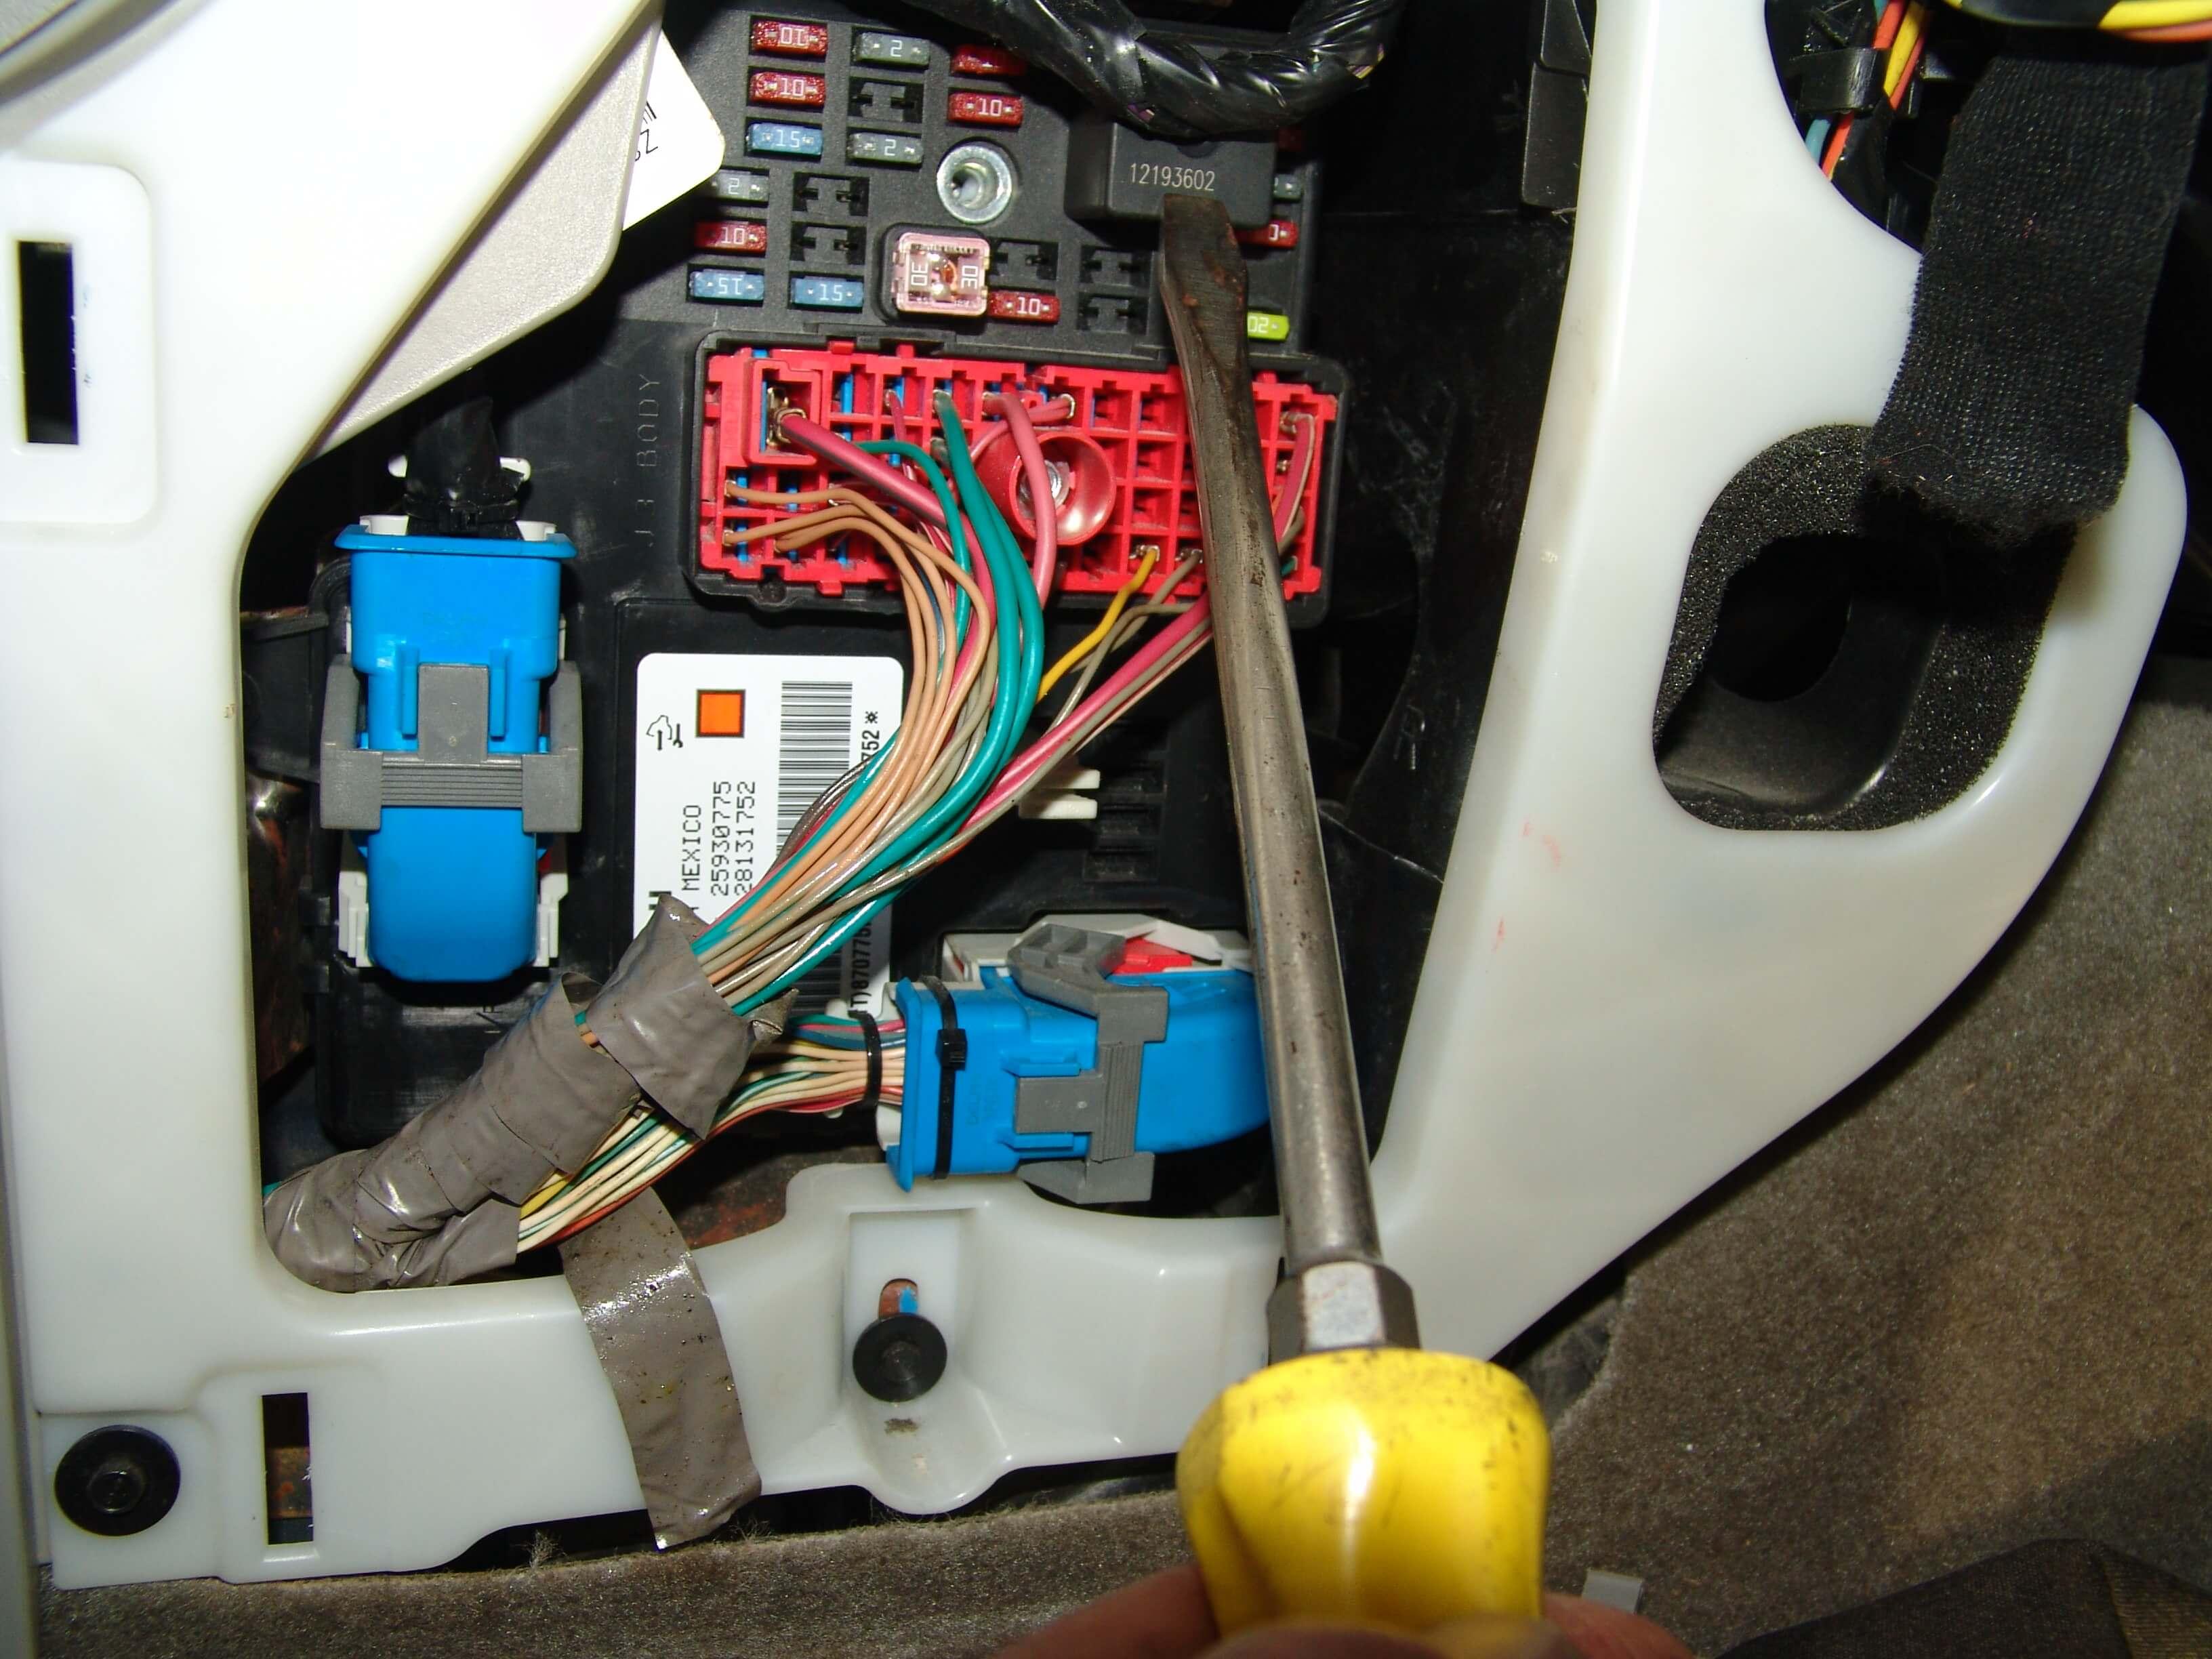 sparkys answers 2008 chevrolet cobalt  blower inop cobalt blower inoperable 2008 yaris fuse box